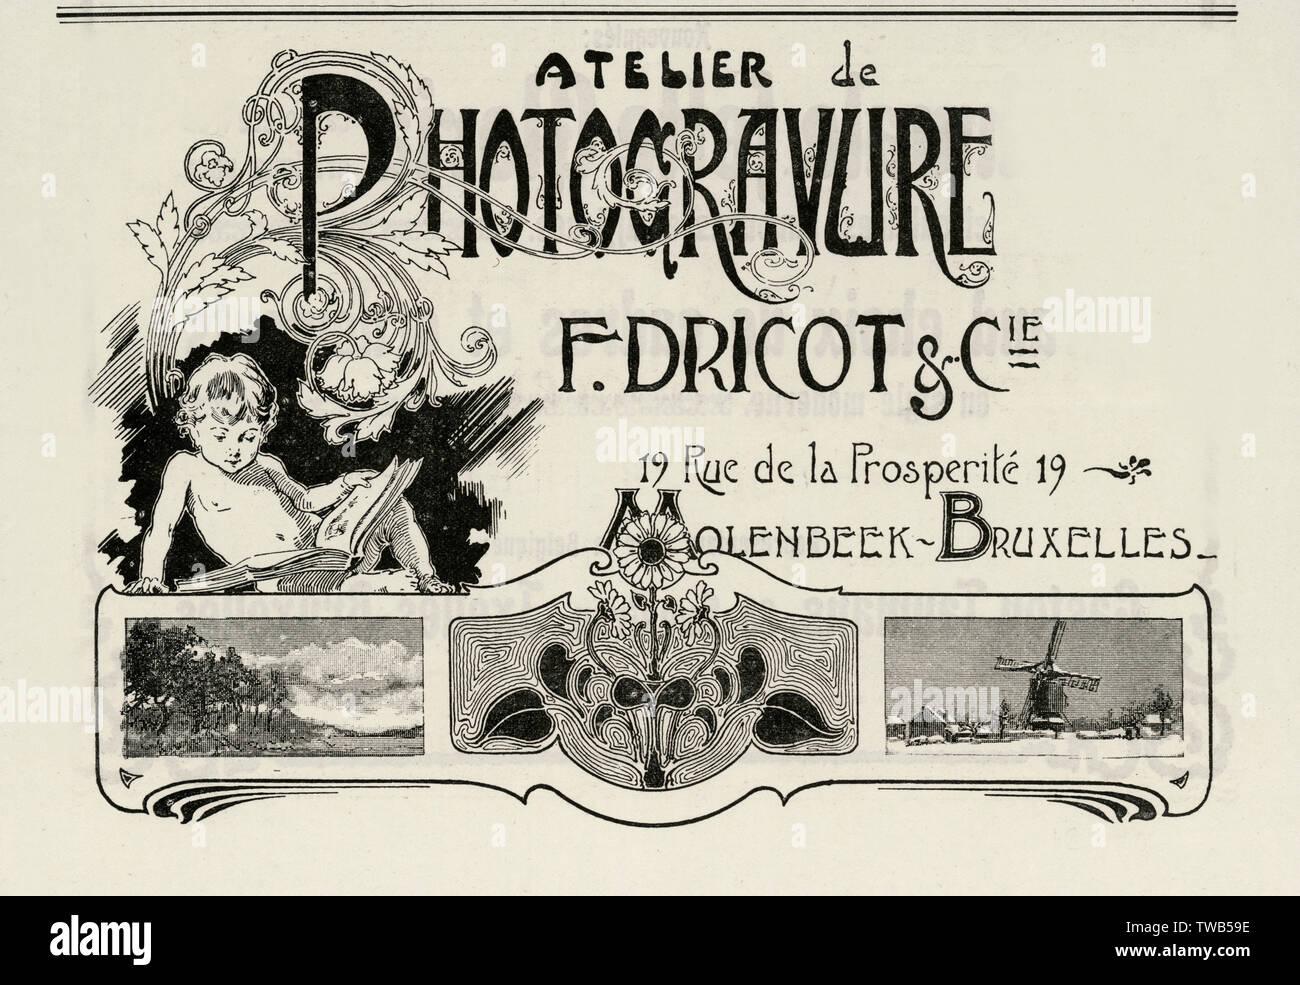 Un anuncio/tarjeta para un fotógrafo, F. Dricot en Molenbeek, Bruselas. Fecha: 1900 Foto de stock